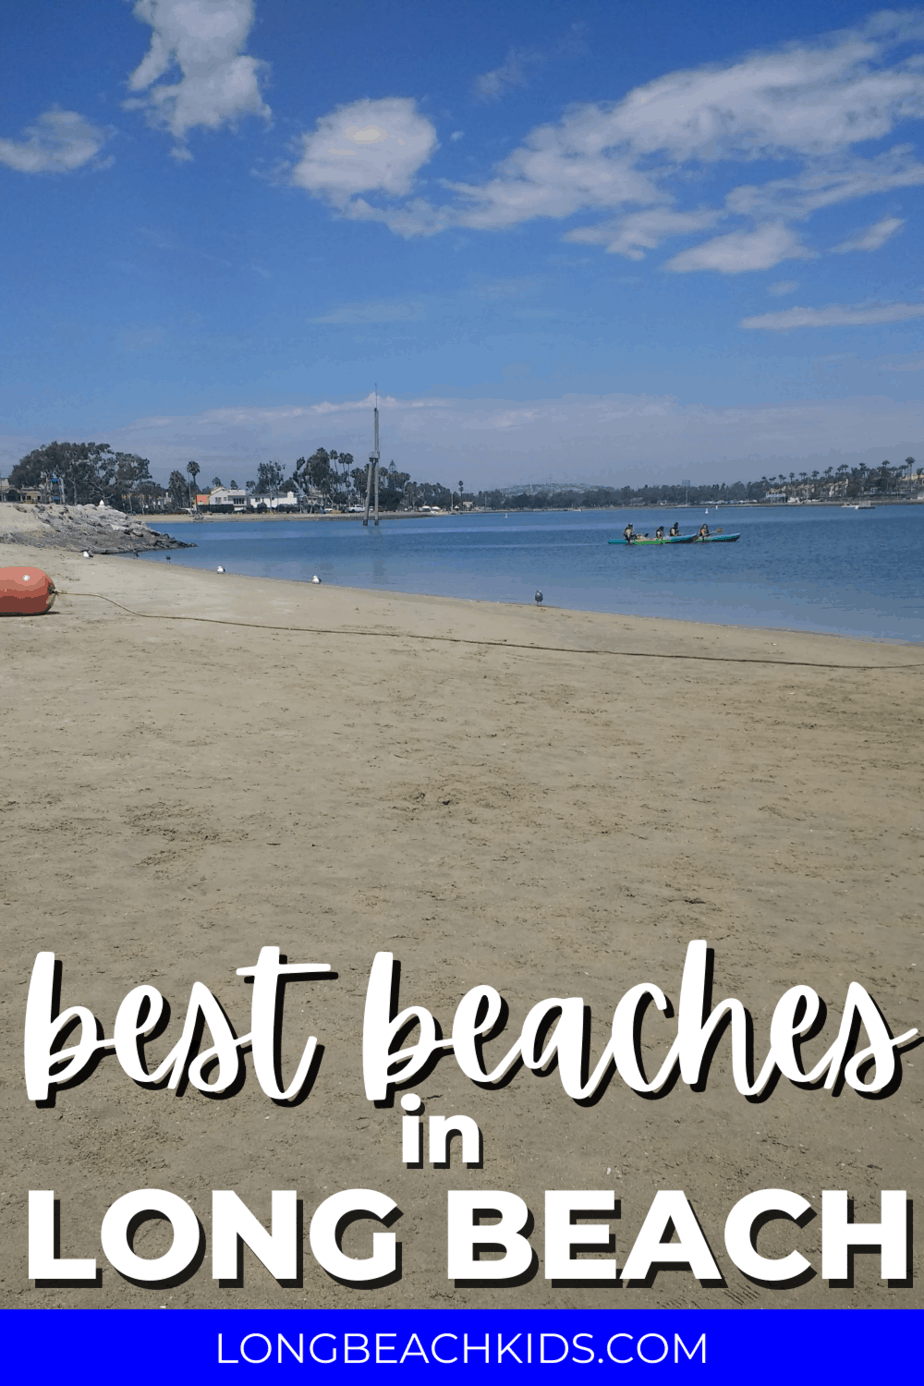 mothers beach in long beach; text: best beaches in long beach